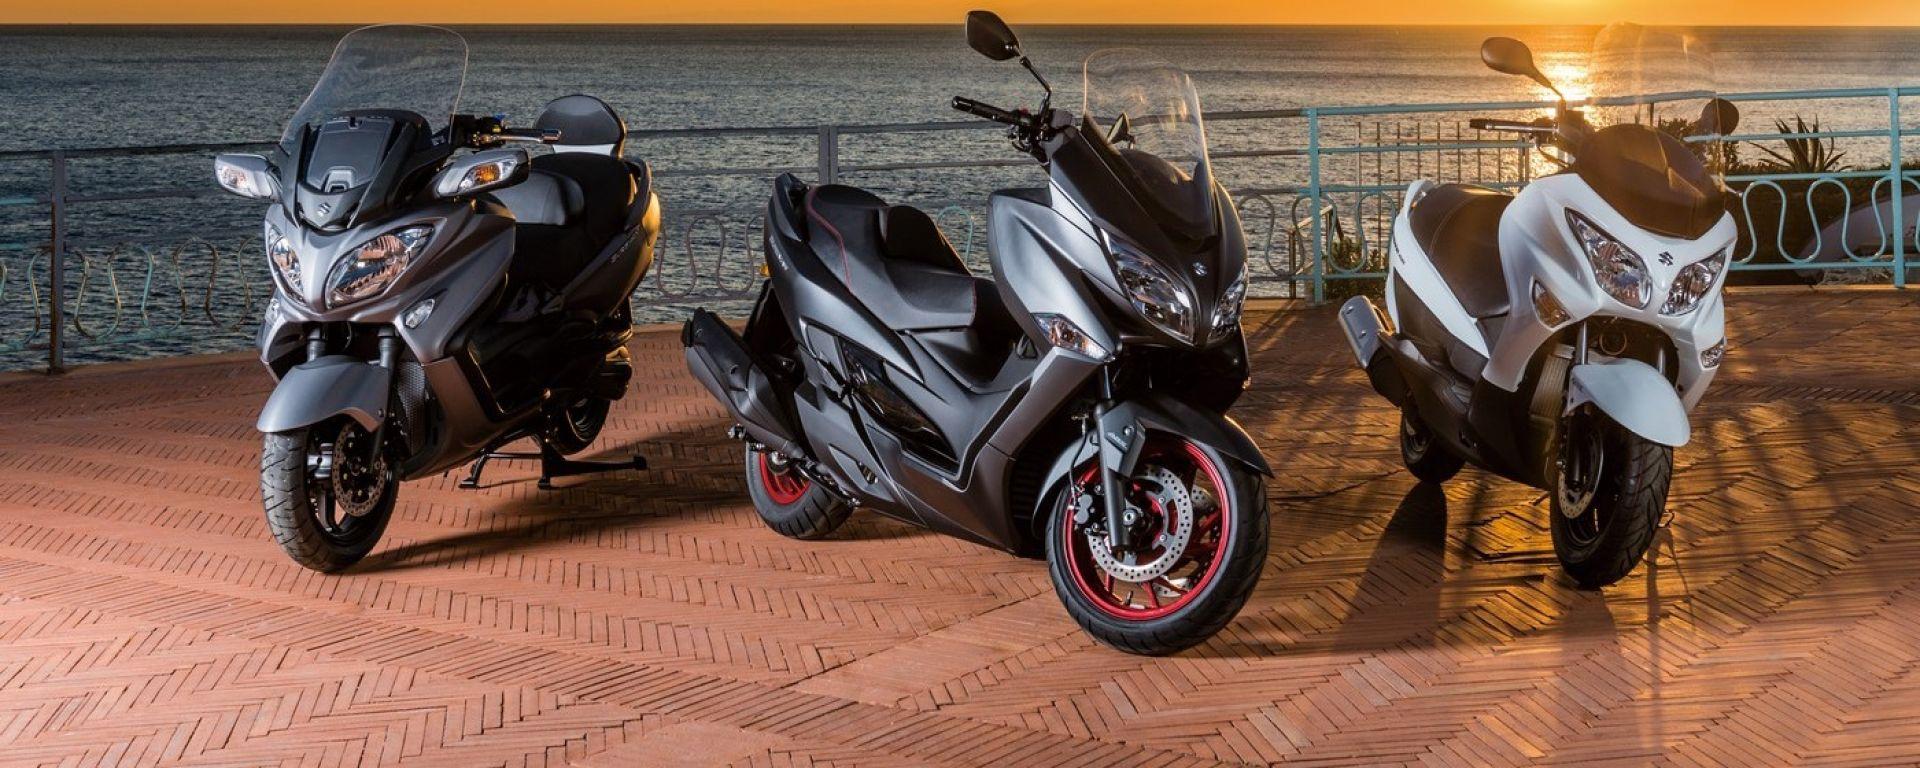 Suzuki Burgman 400 2017, Motodays